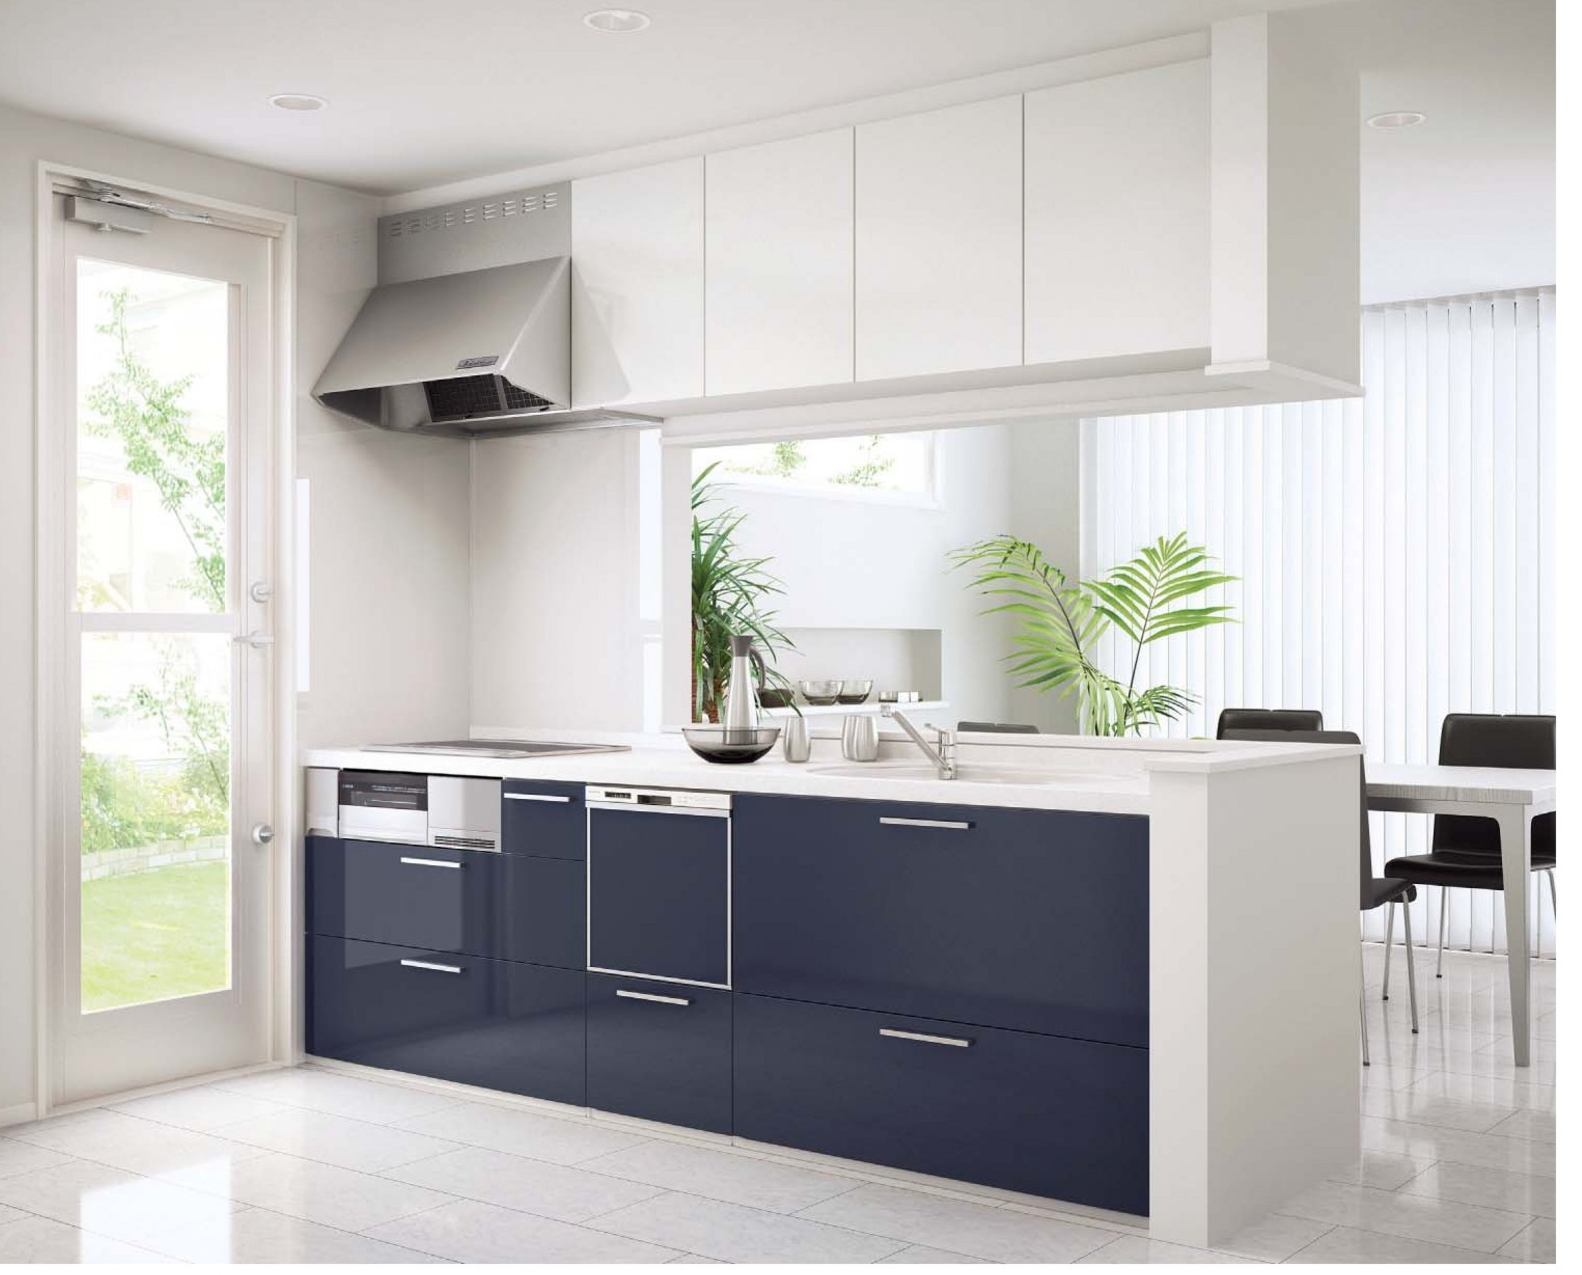 Inspiring IKEA Kitchen Cabinets